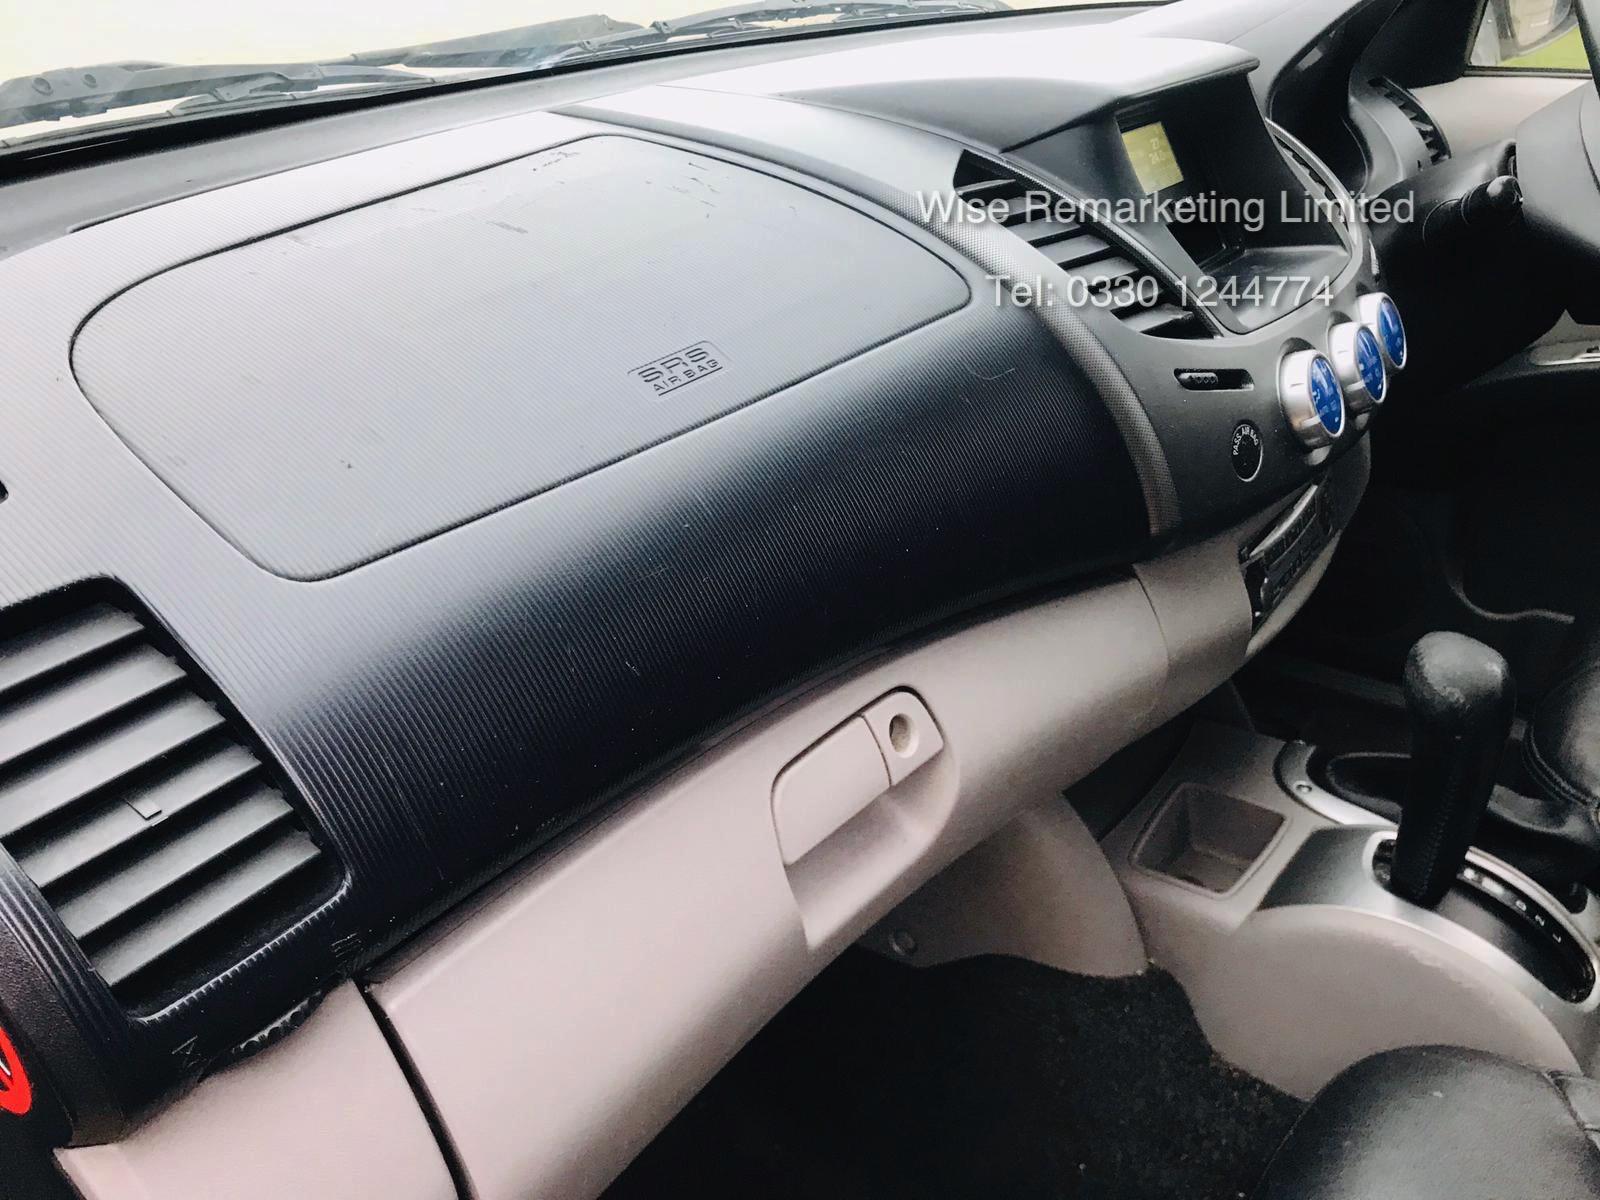 Mitsubishi L200 2.5 DI-D Warrior Auto - 2008 08 Reg - Full Leather - SAVE 20% NO VAT - Image 17 of 26